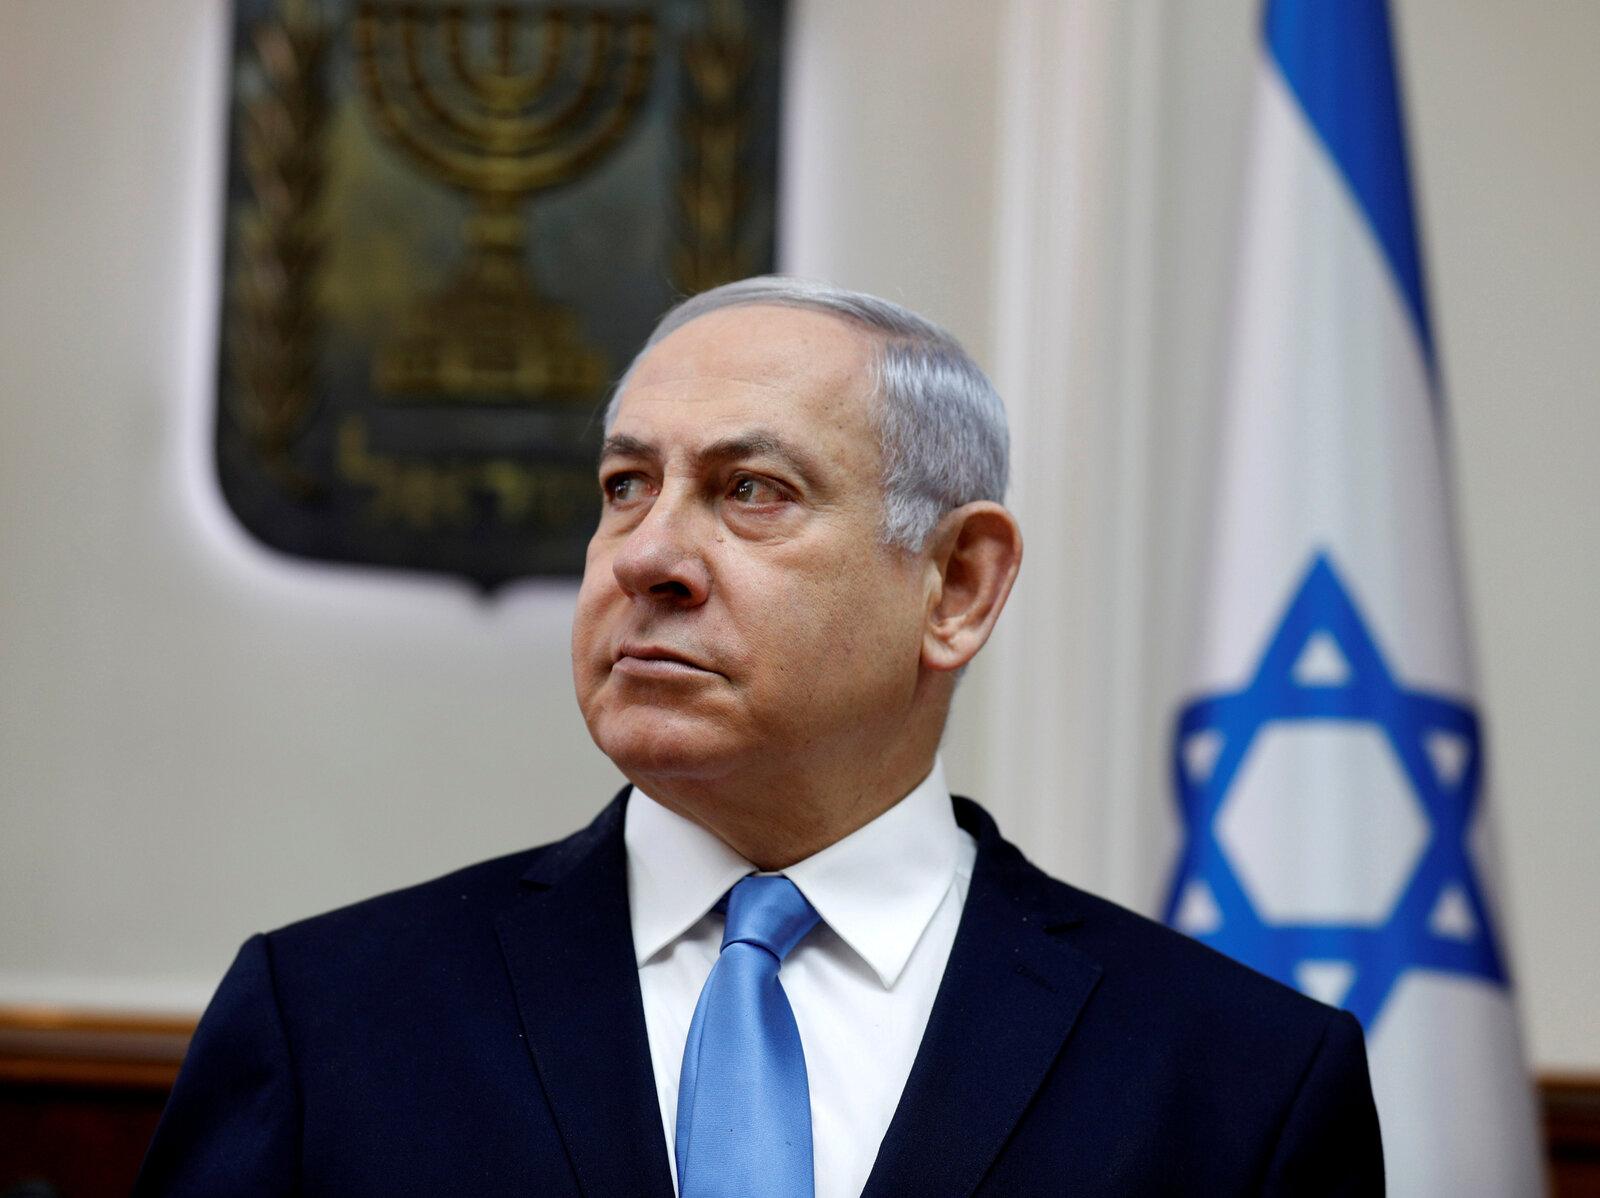 netanyahu-israel-election-647a09faeee3fc35183c2ede303347515b206013-s1600-c85.jpg